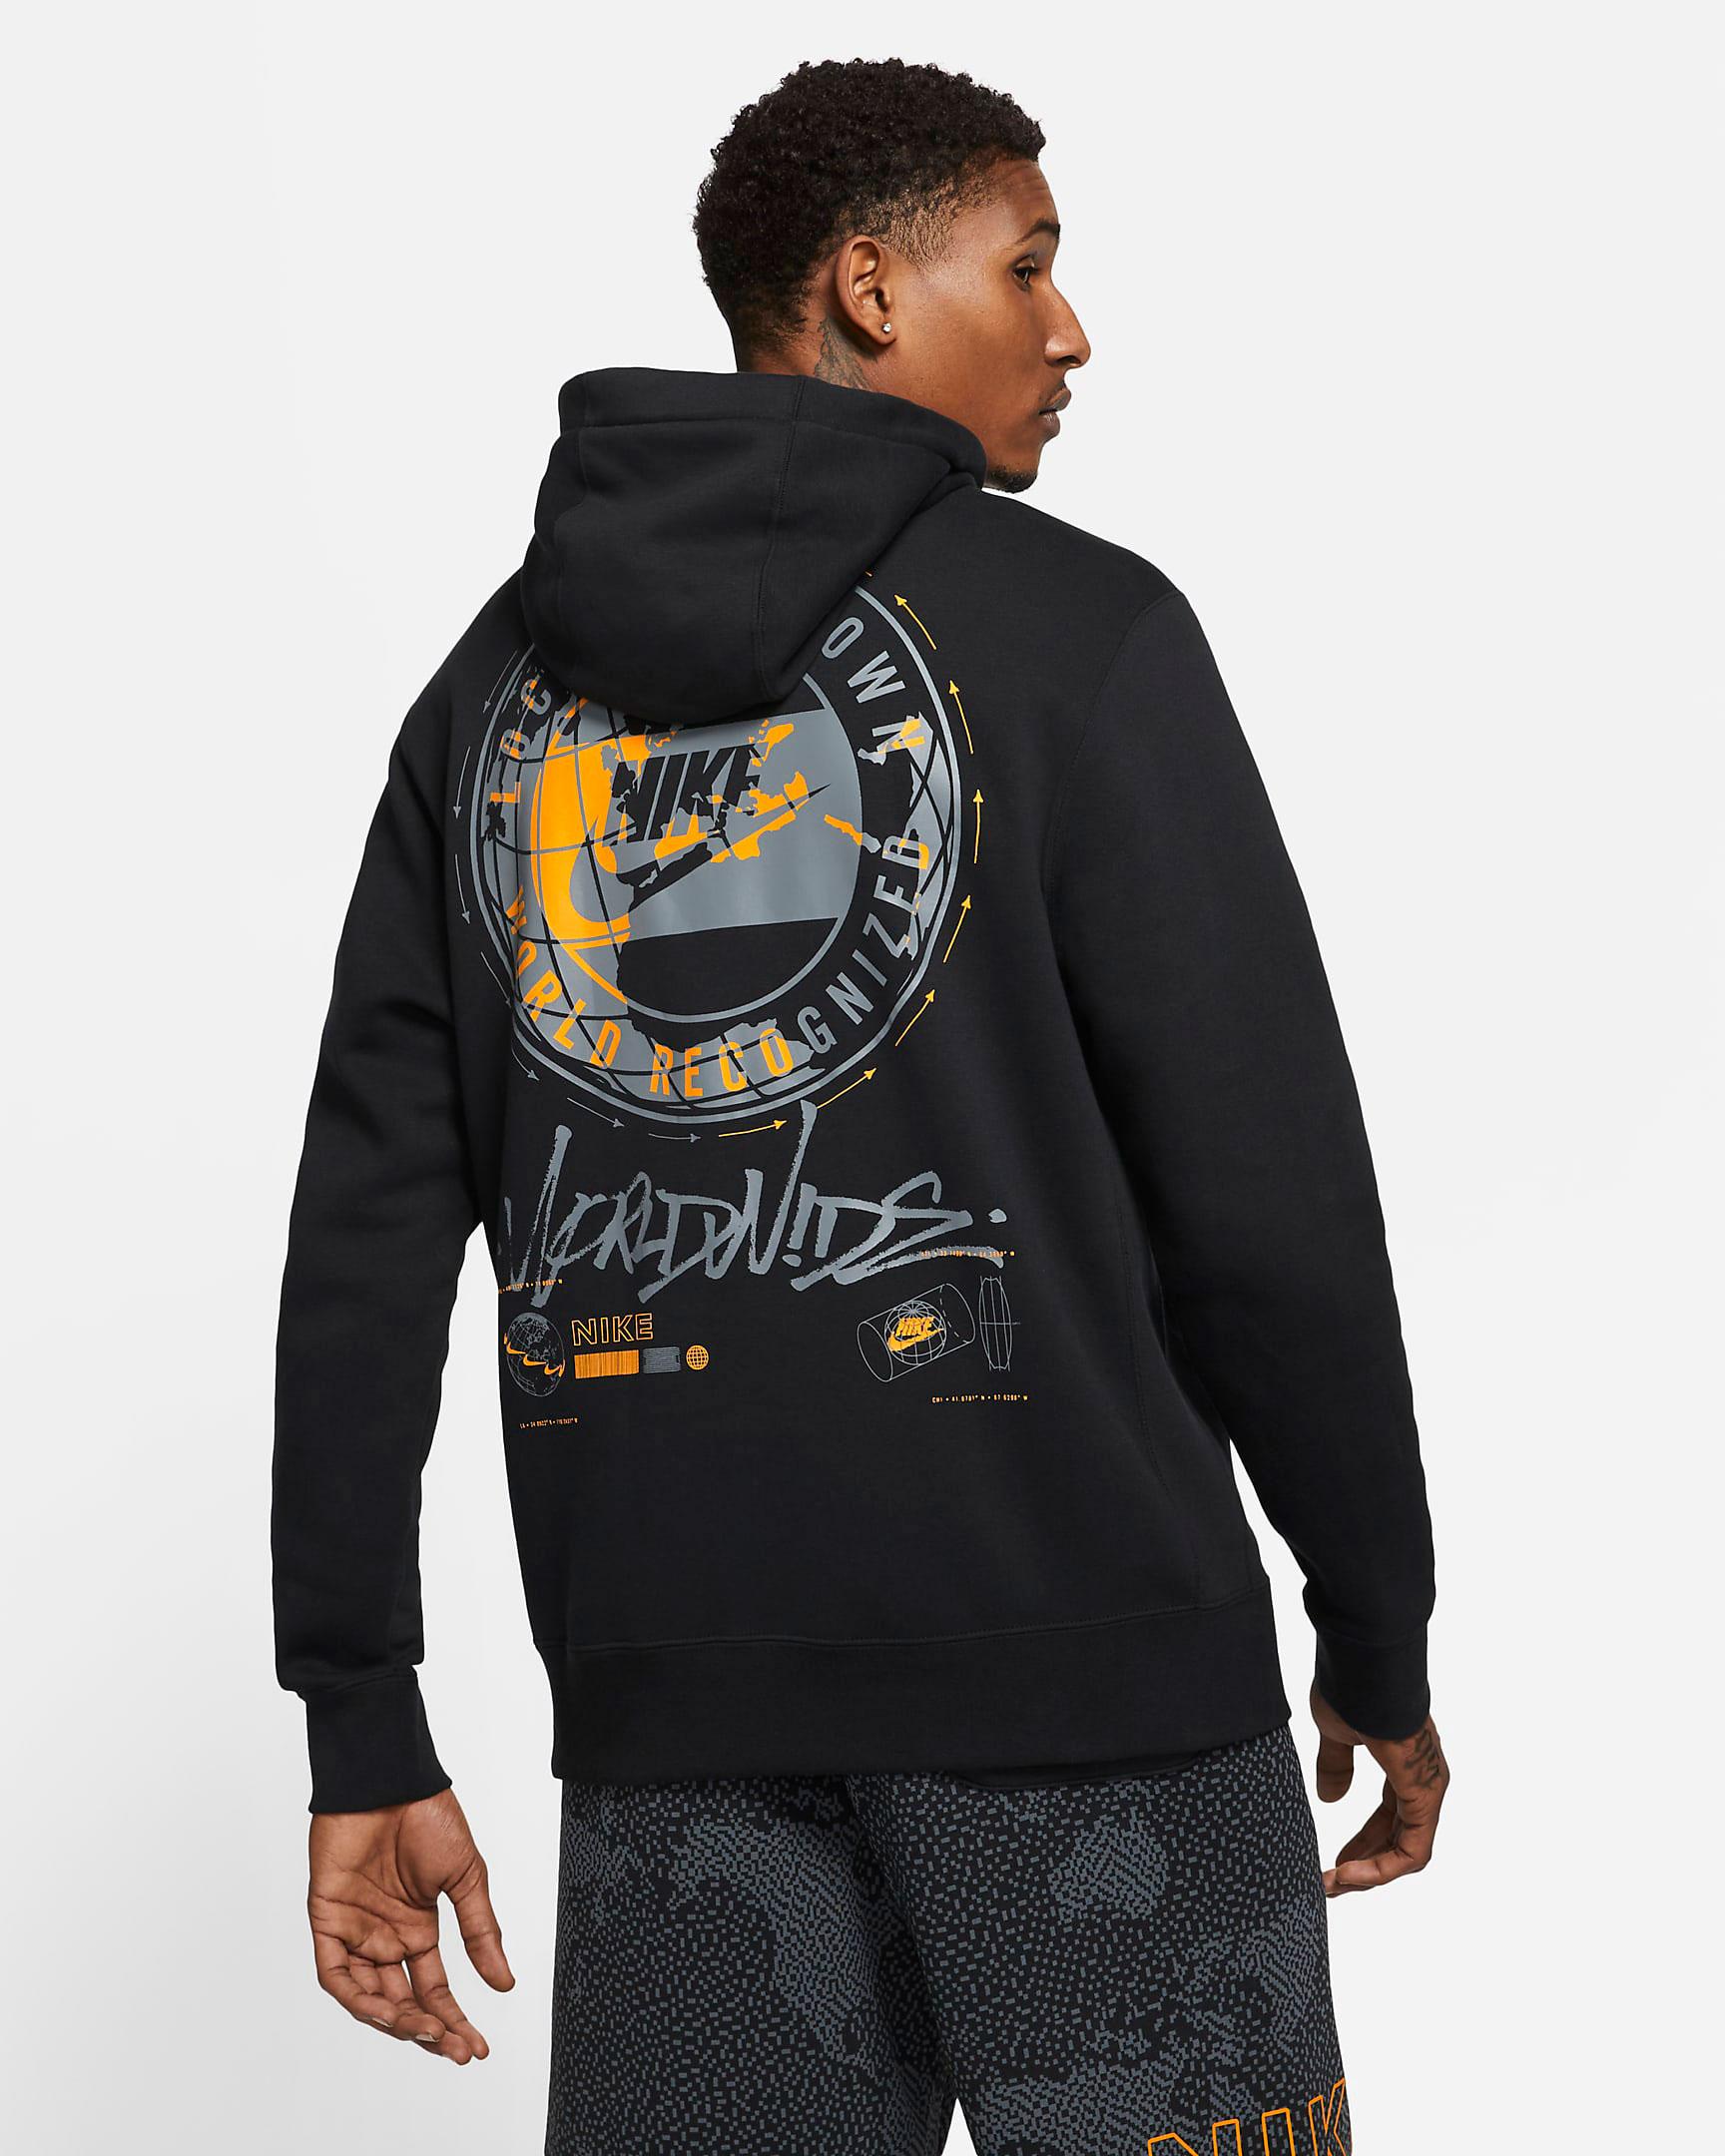 jordan-9-university-gold-nike-hoodie-2